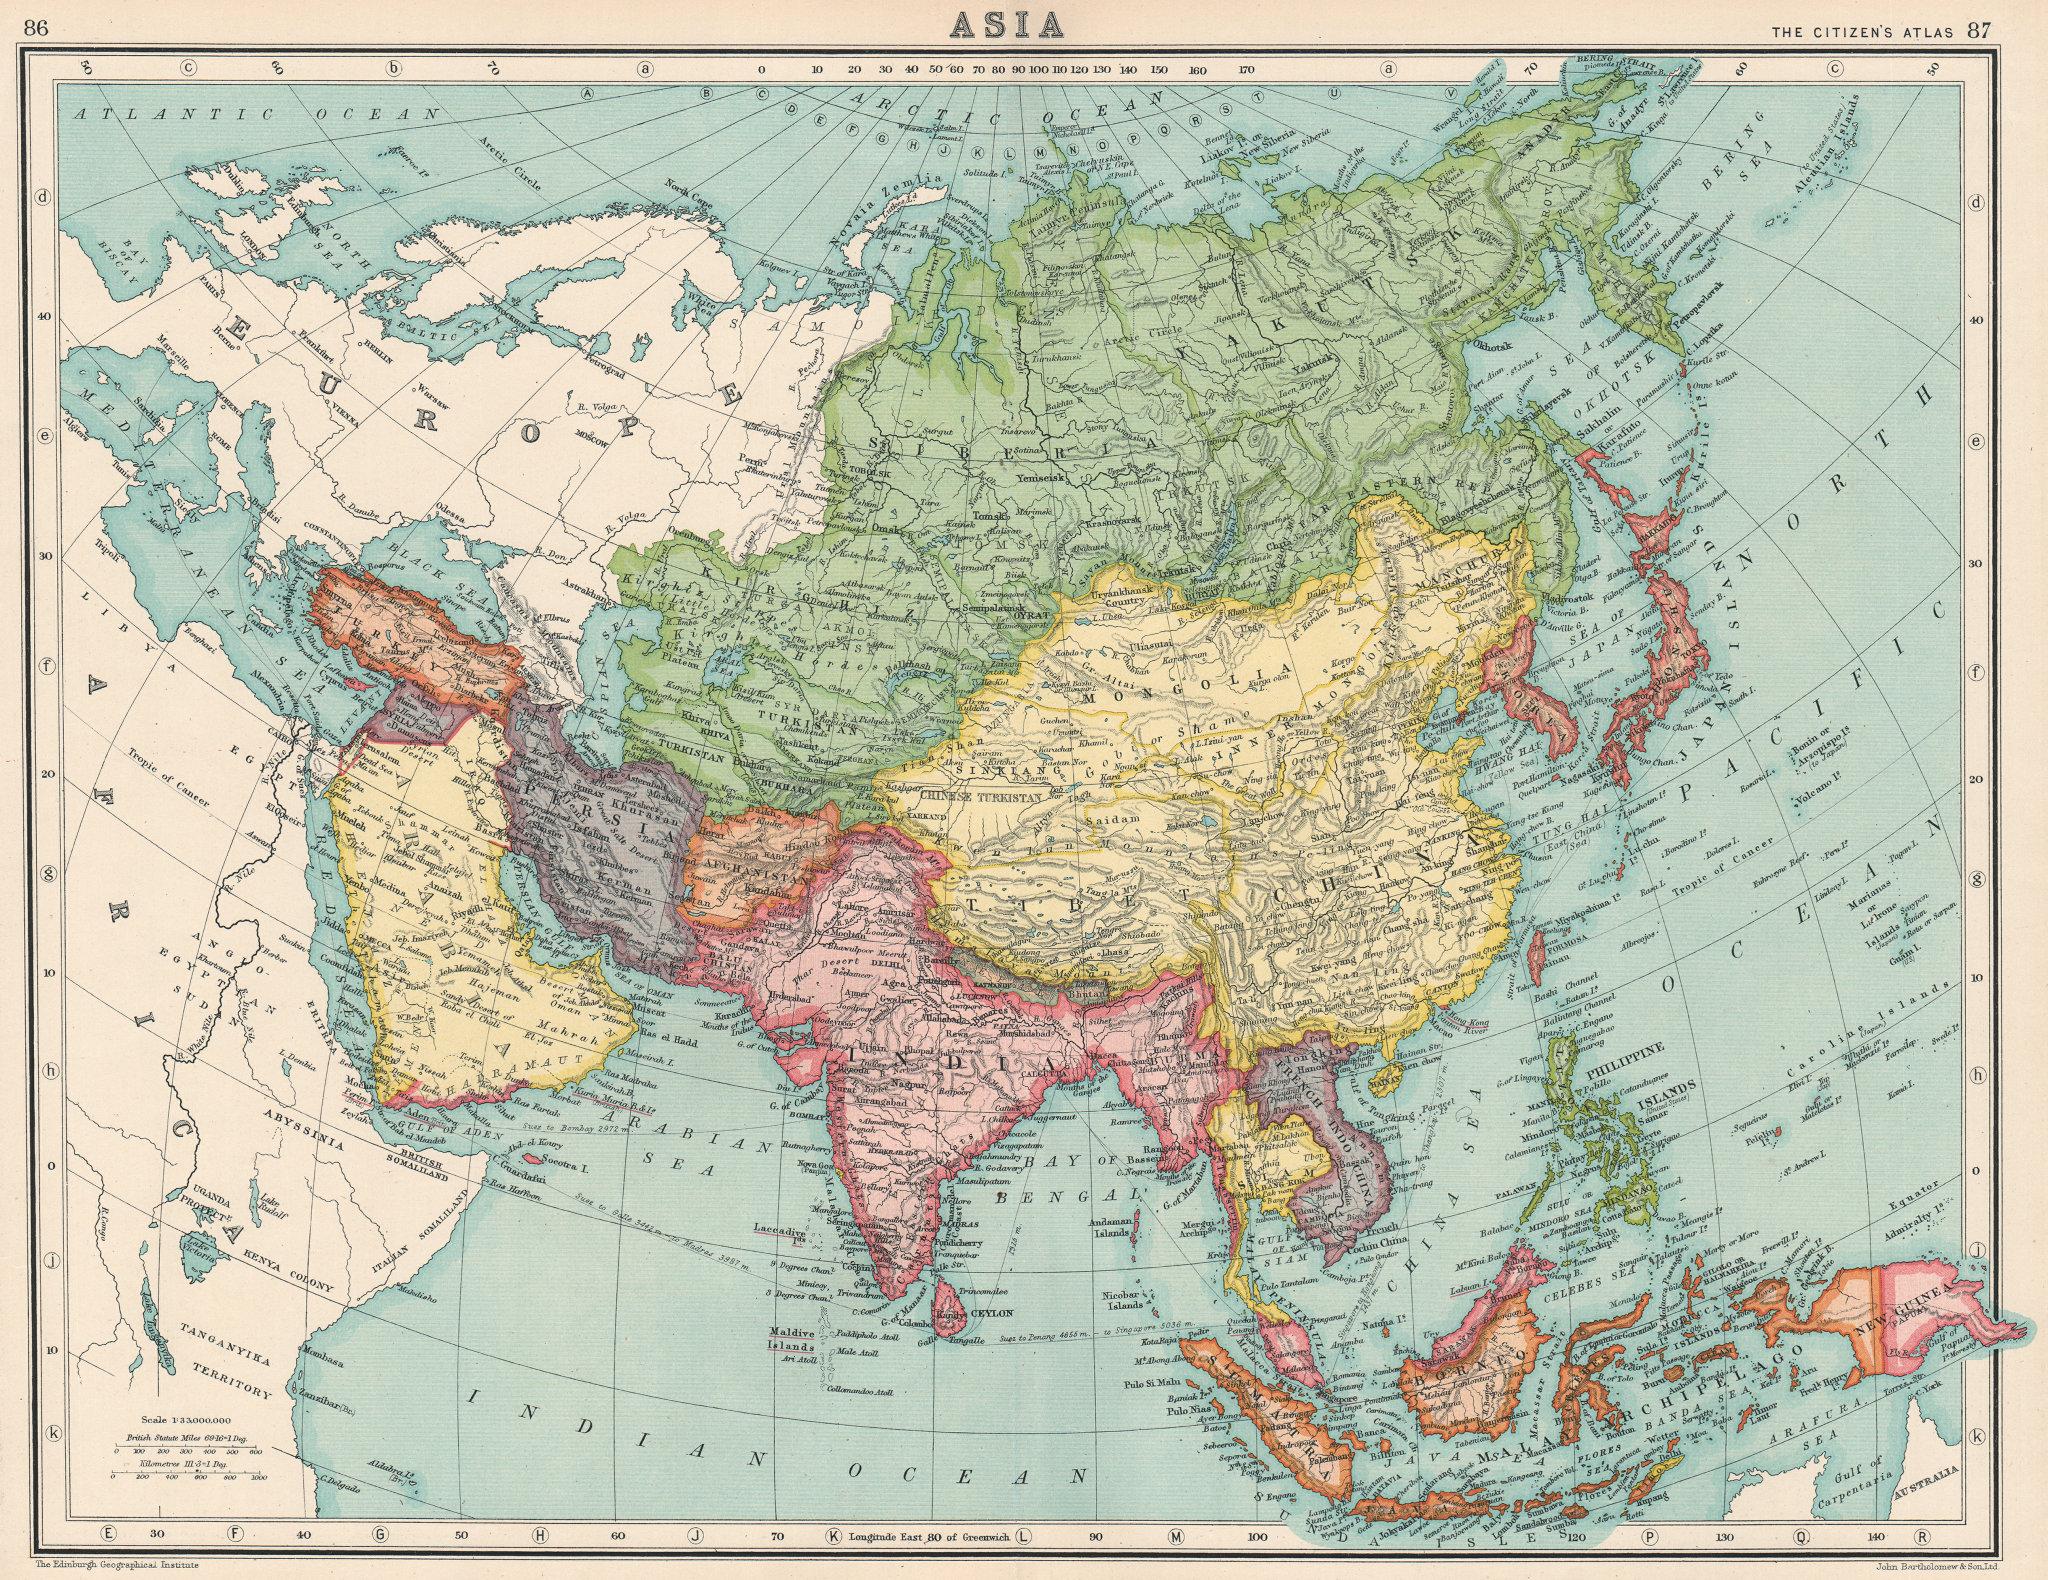 ASIA. British India. Japanese occupied Korea. Syria & Lebanon unified. 1924 map